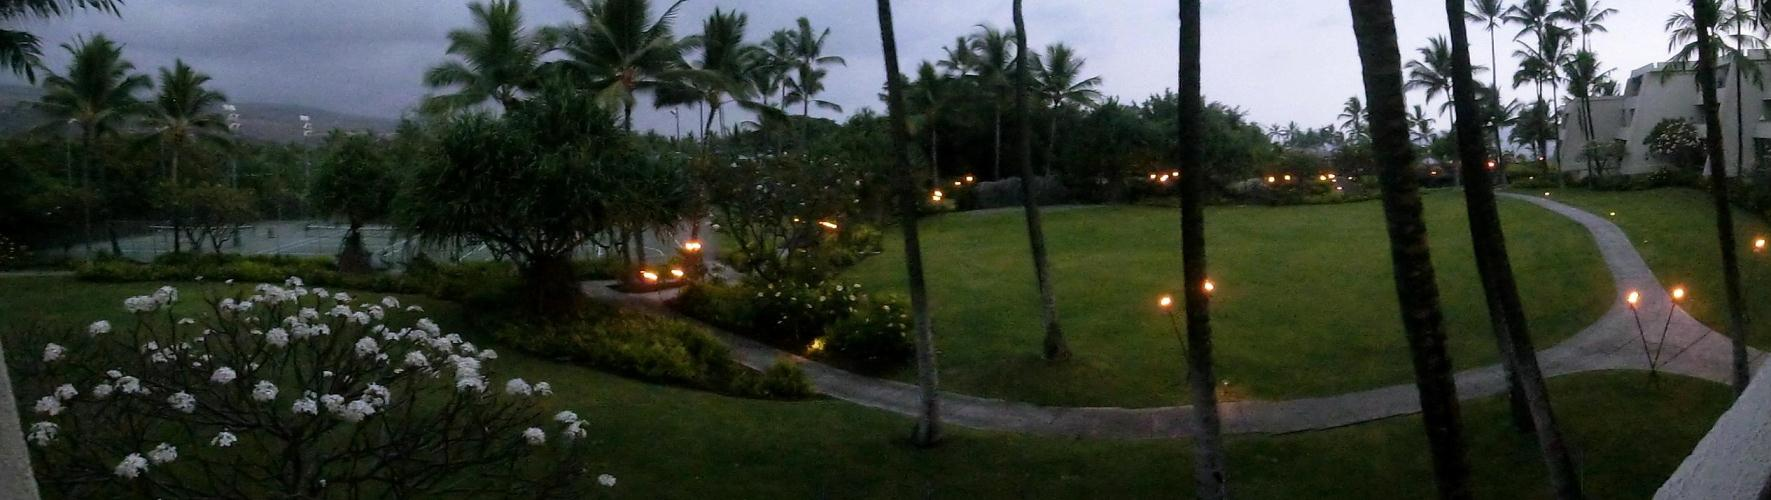 Hotel Grounds panorama night view